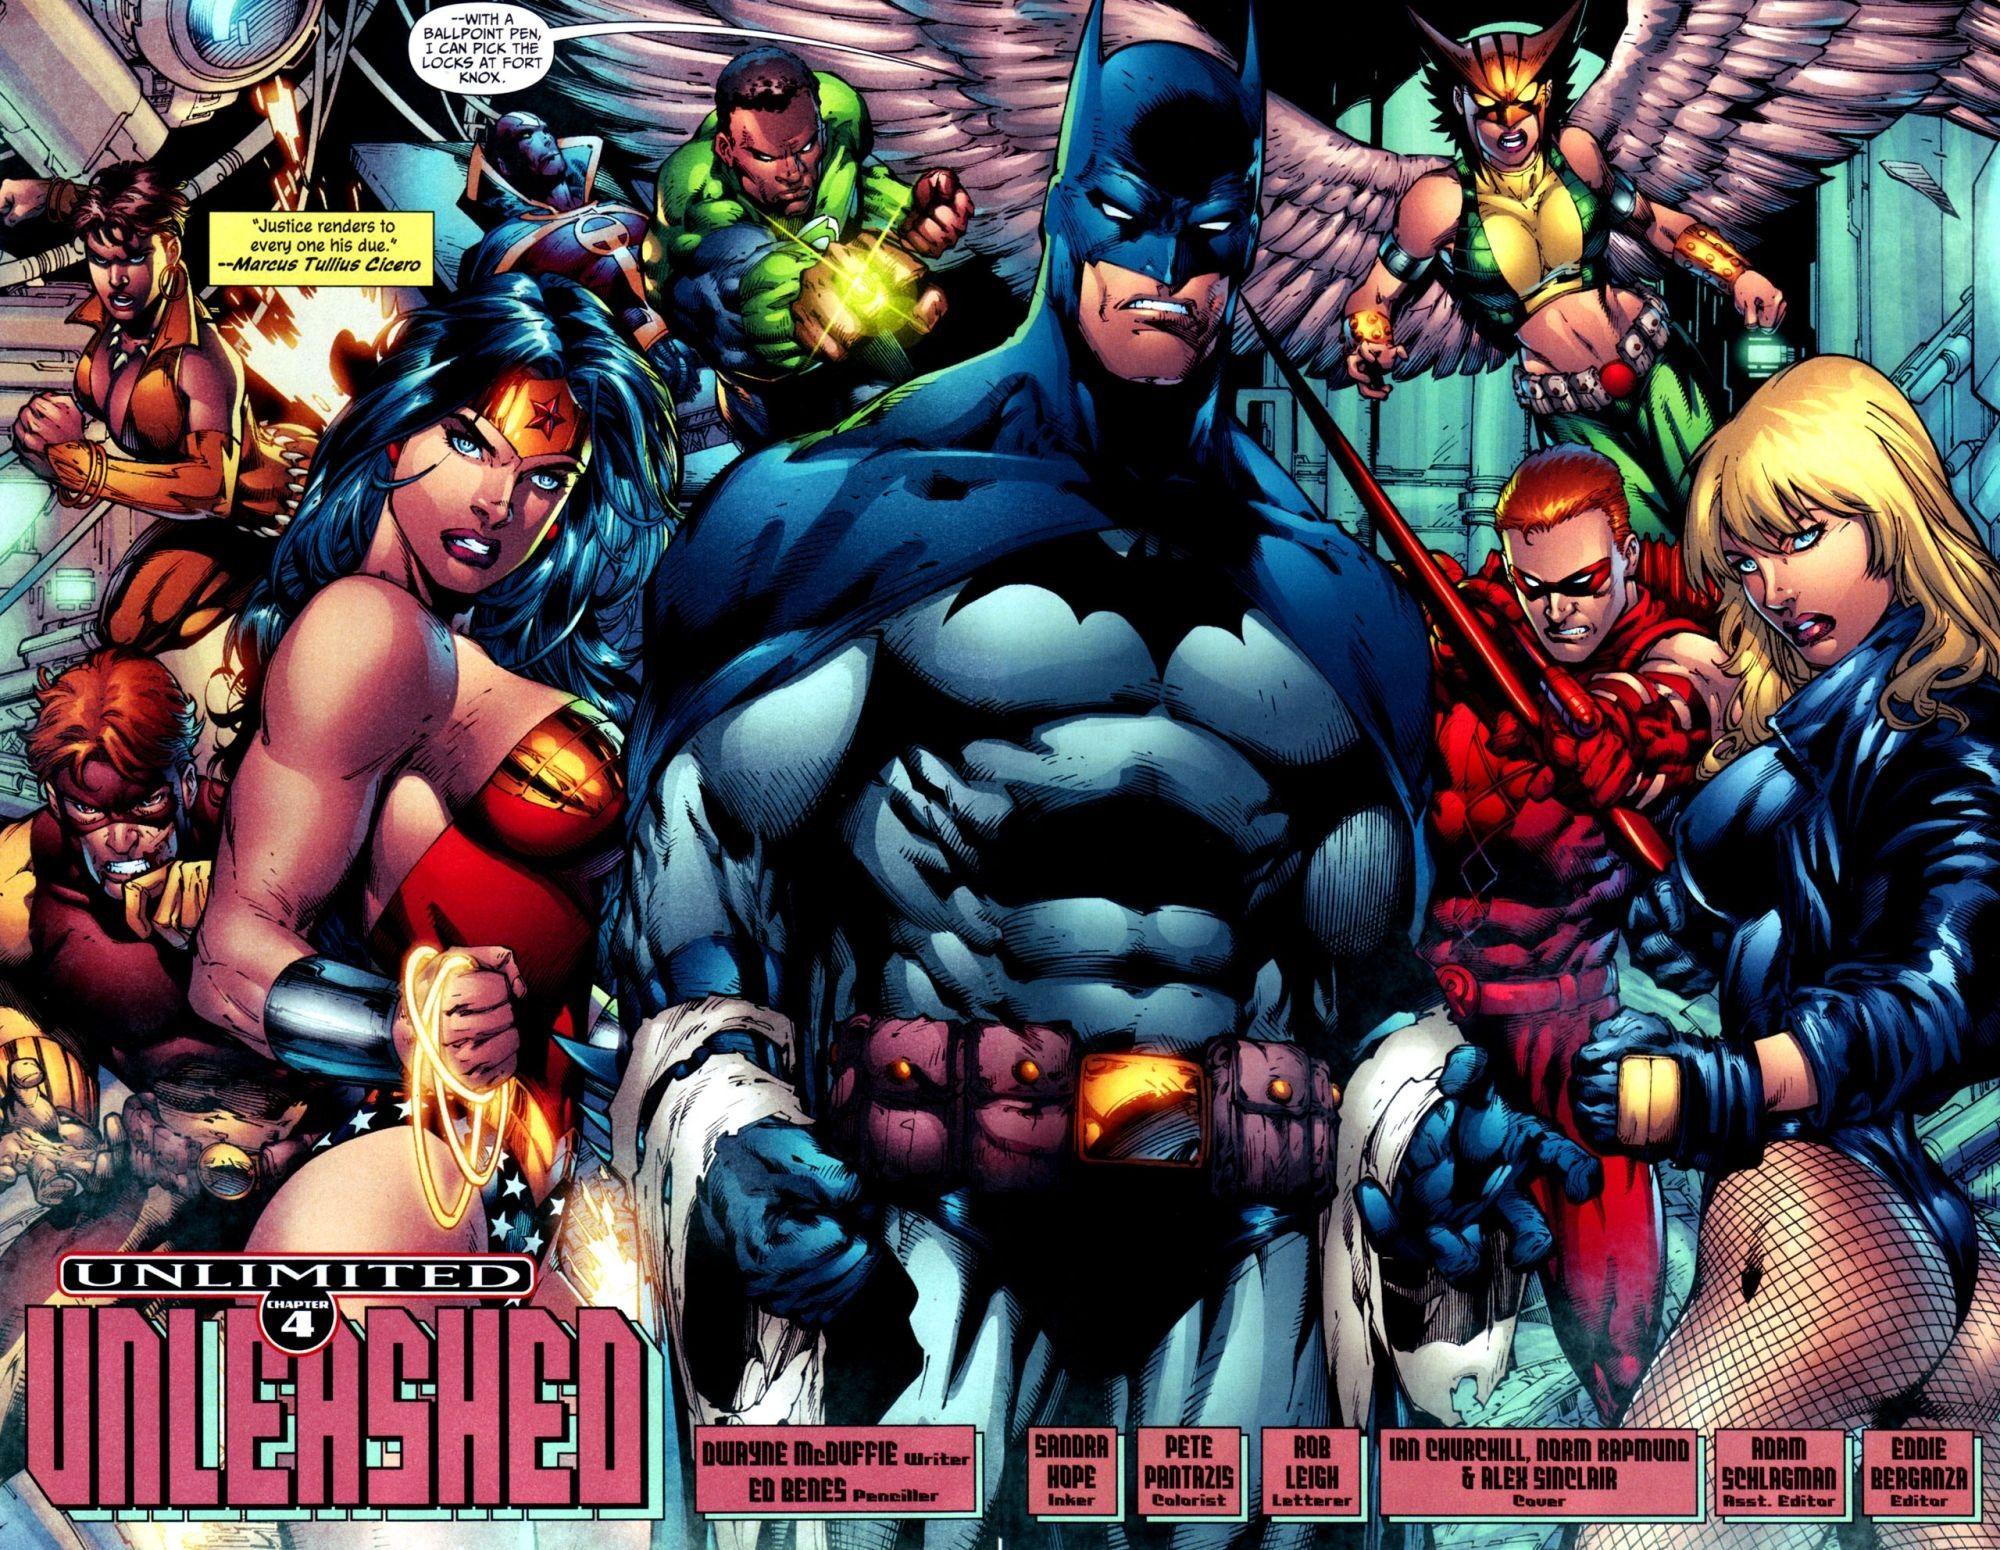 Justice League Dc Comics Superheroes Wallpapers: Hd Desktop Wallpaper - Dc Comics Comics